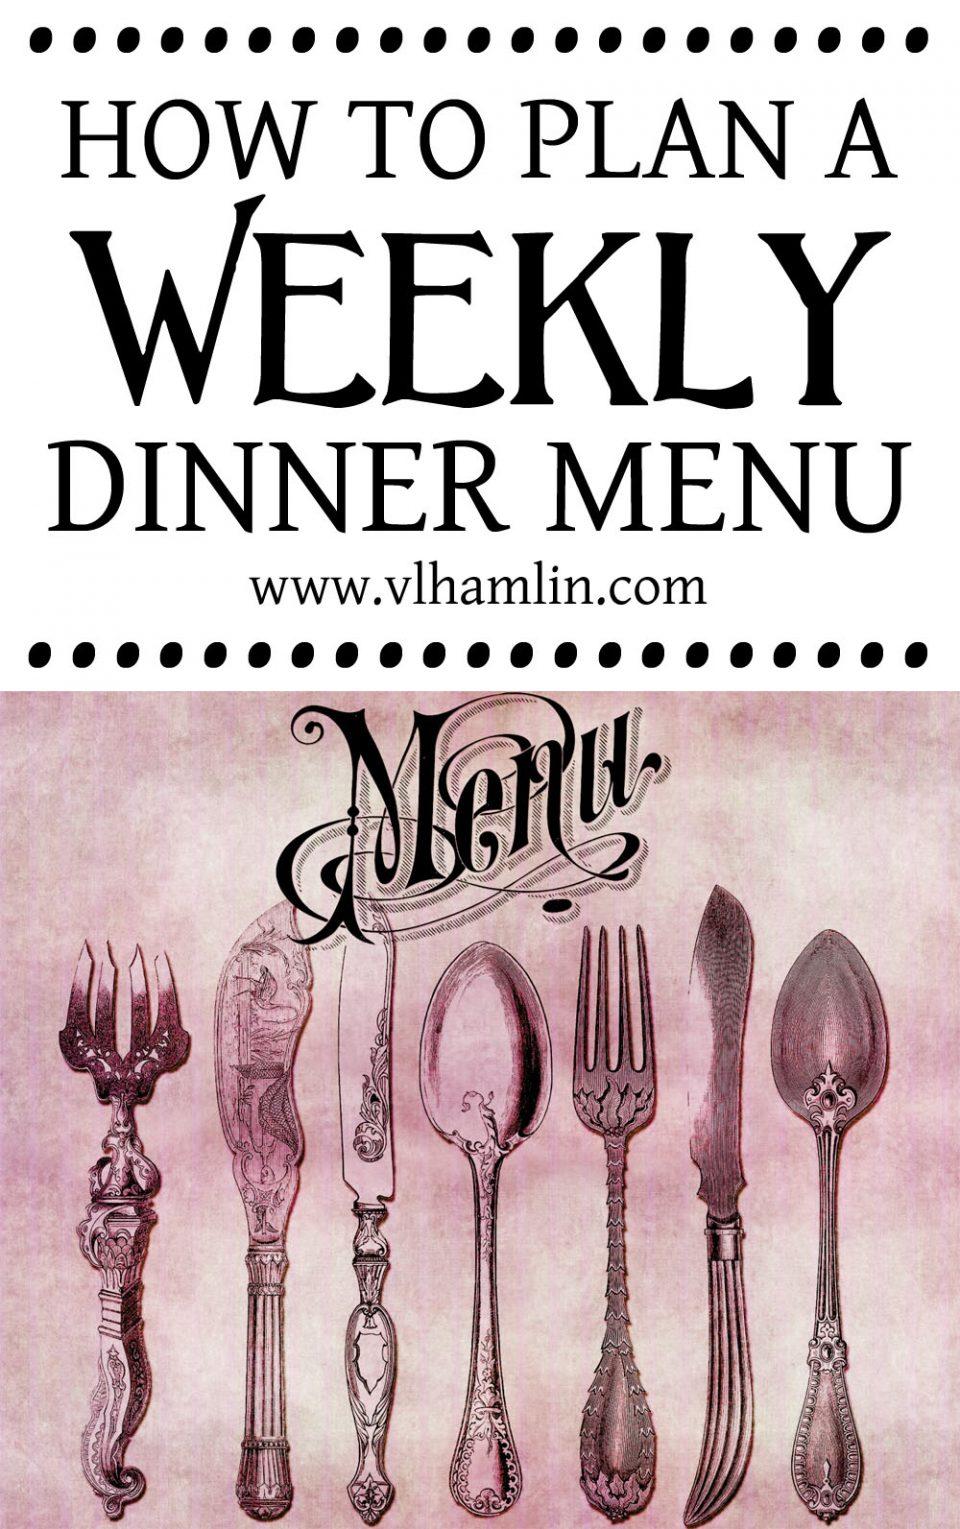 How to Plan a Weekly Dinner Menu 1